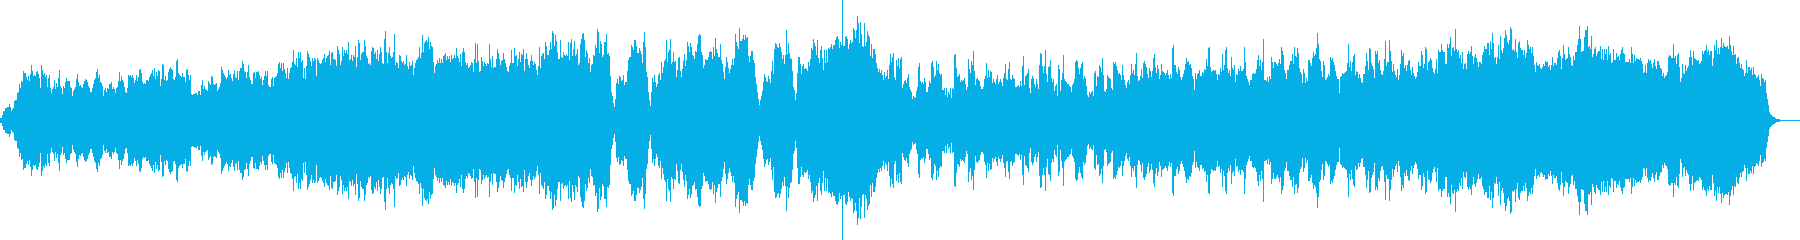 Dramatically sad strings's reproduced waveform